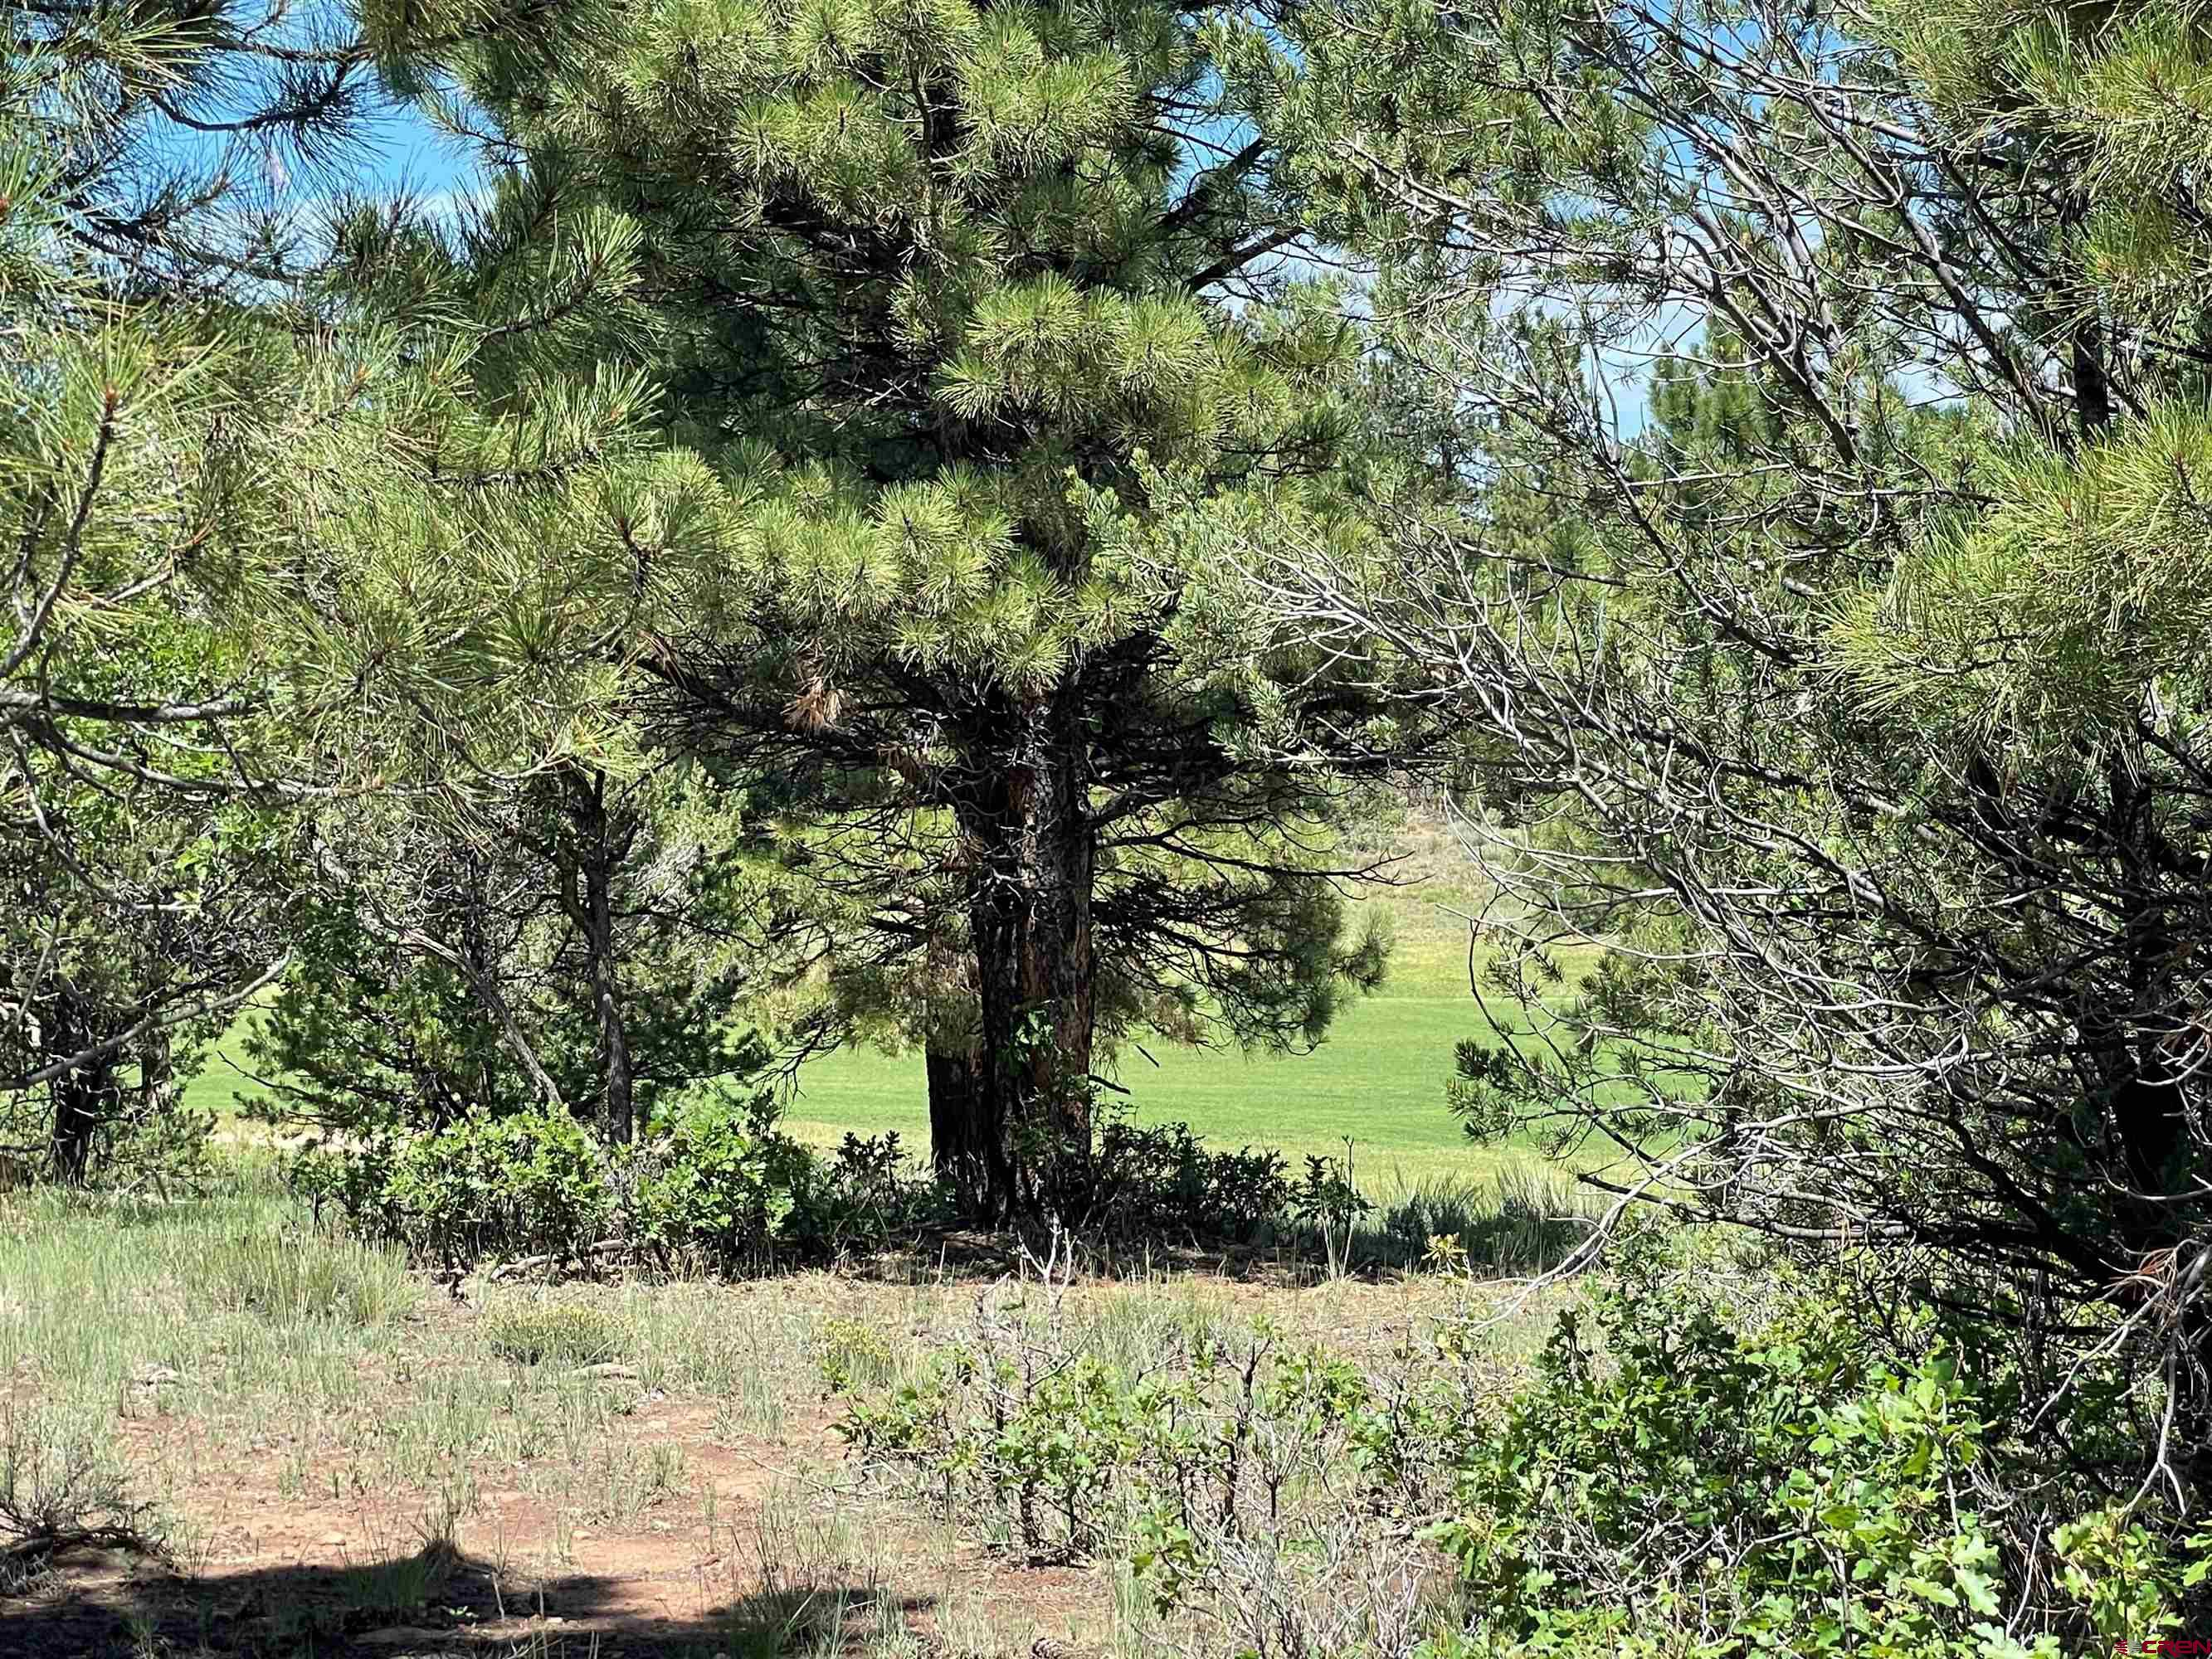 Tbd (lot 546) N Badger Trail Property Photo